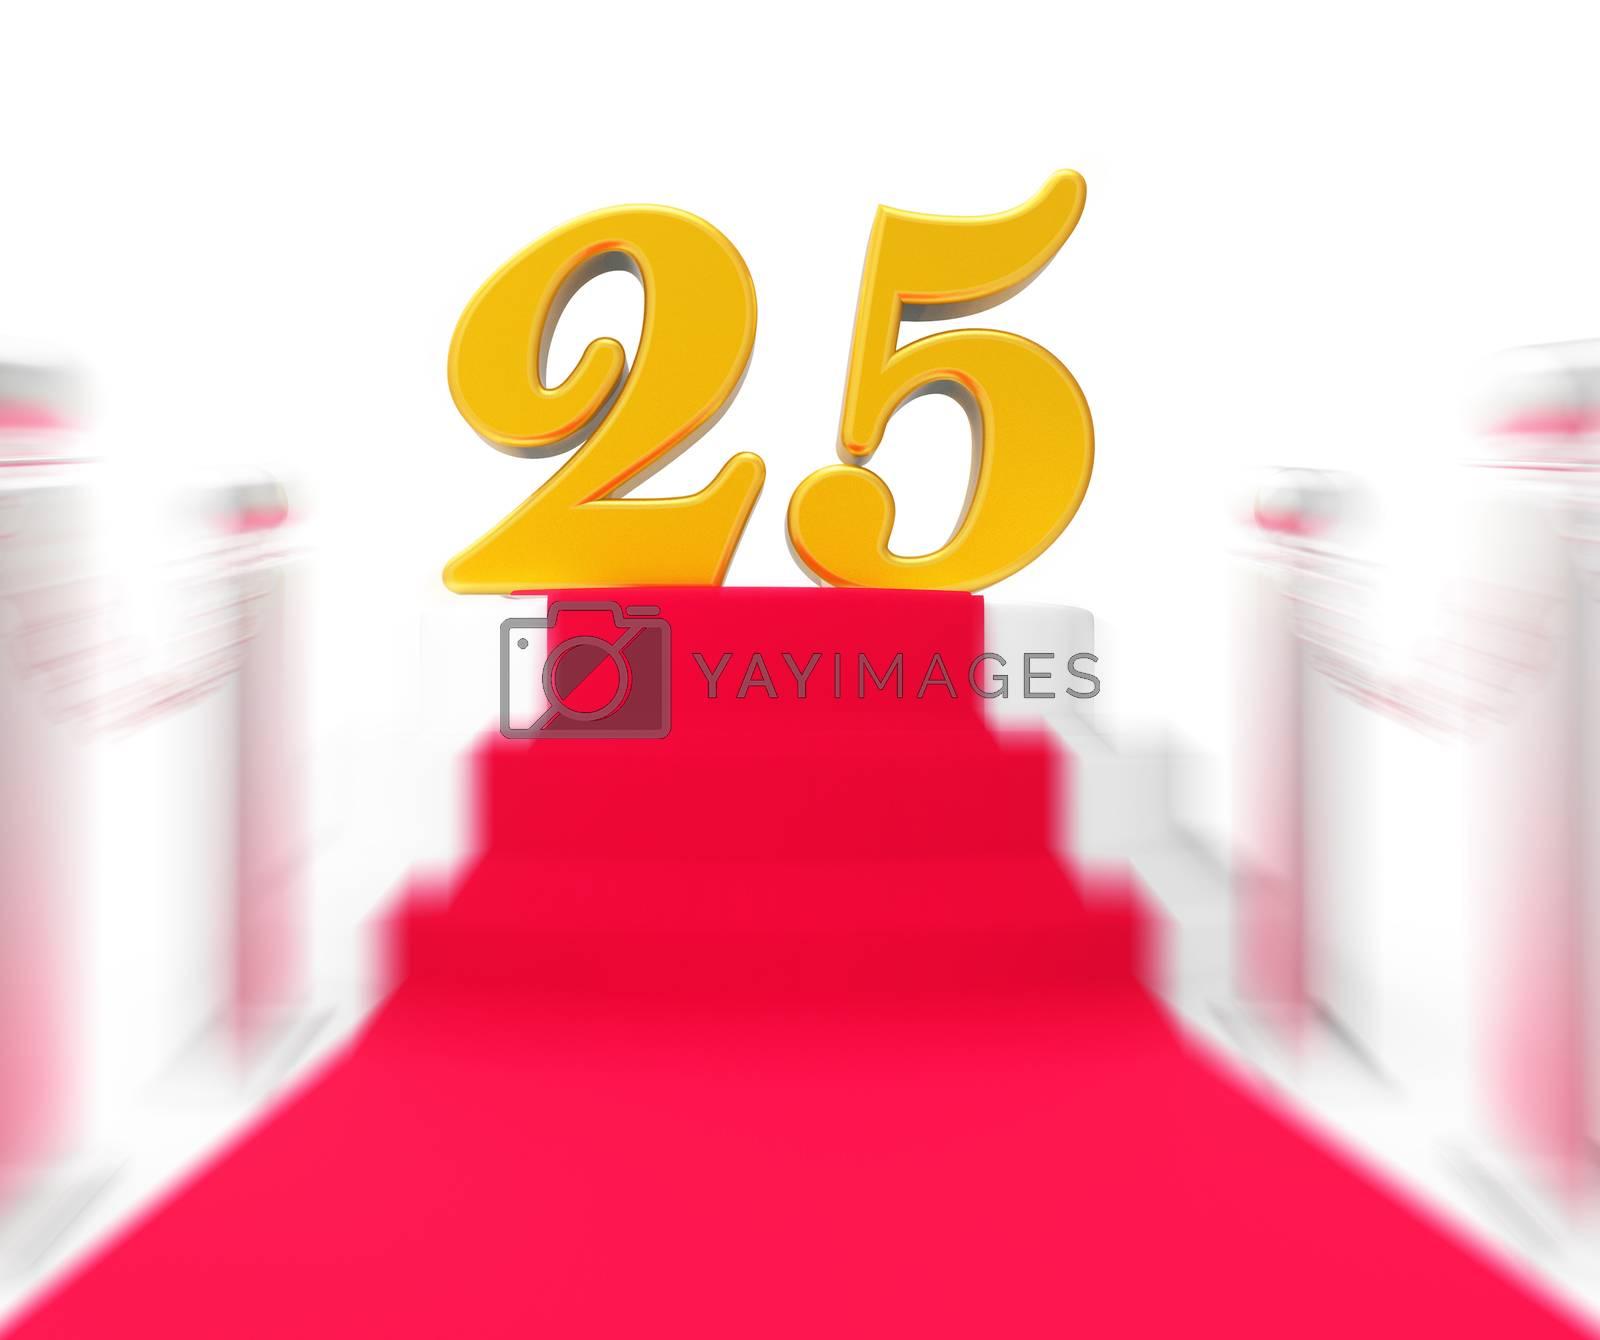 Royalty free image of Golden Twenty Five On Red Carpet Displays Twenty Fifth Anniversa by stuartmiles